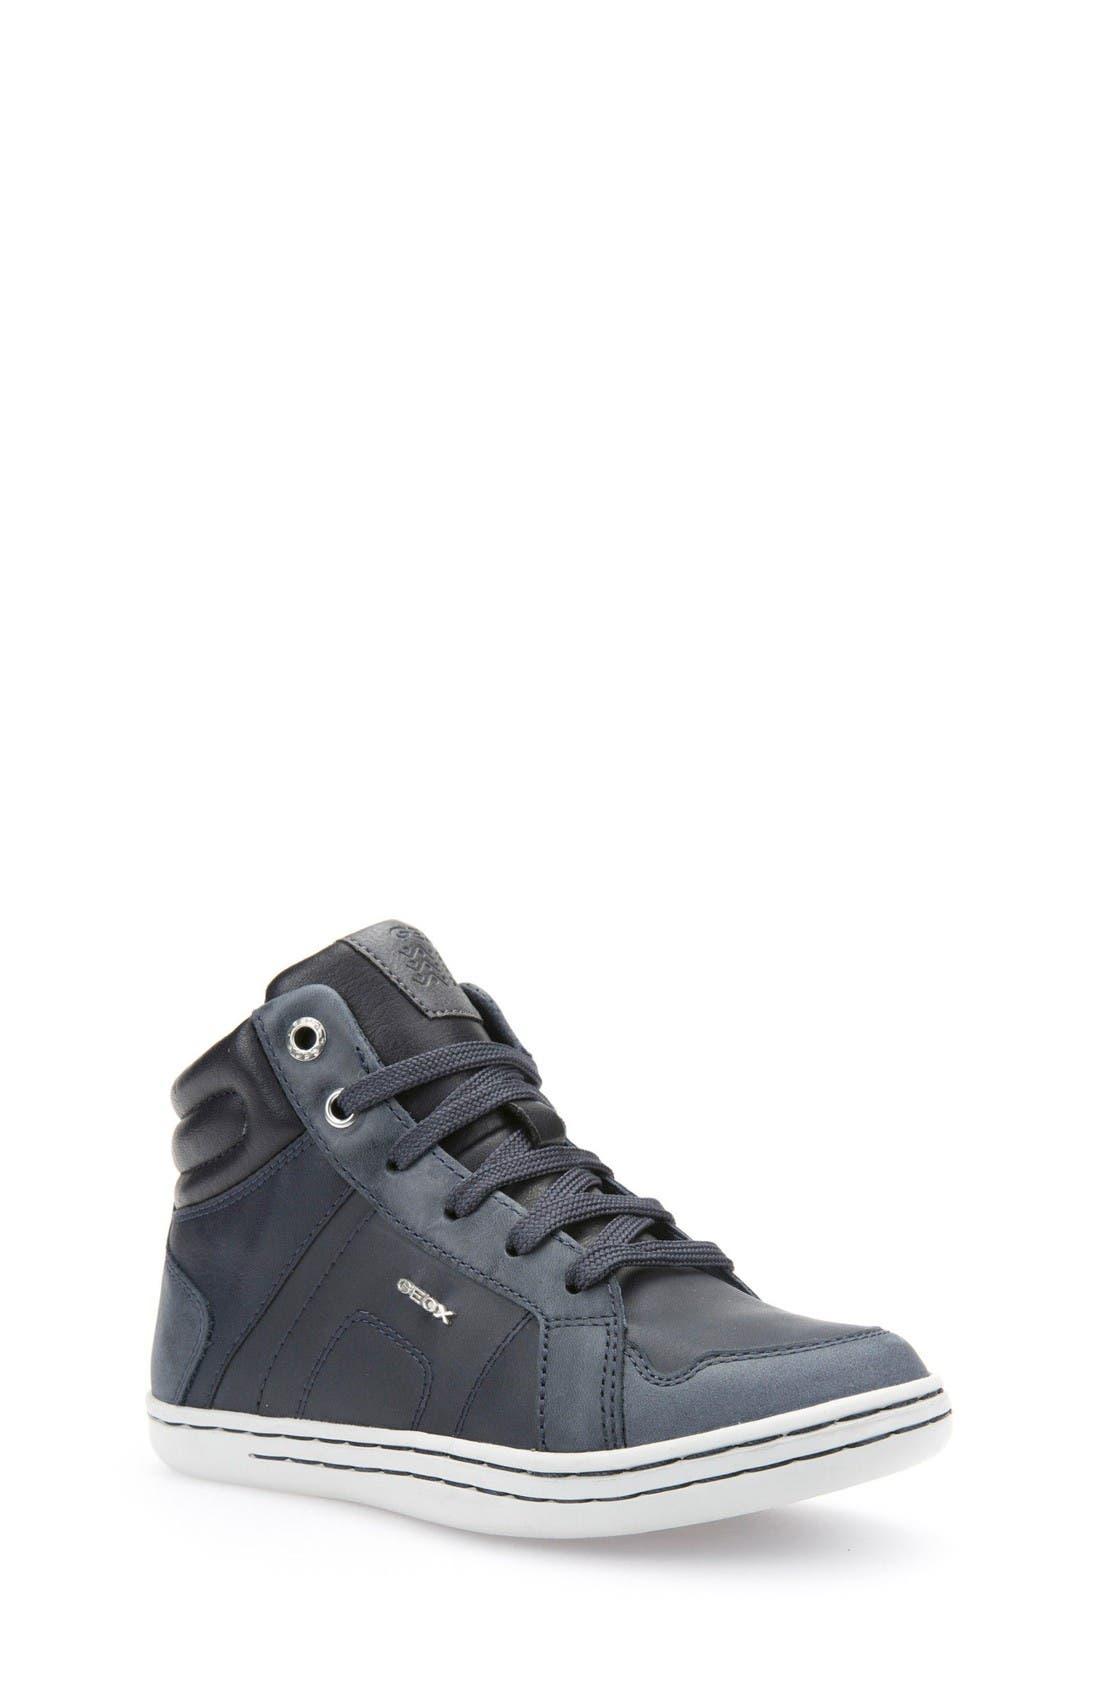 Geox 'Garcia' High TopSneaker (Toddler, Little Kid & Big Kid)